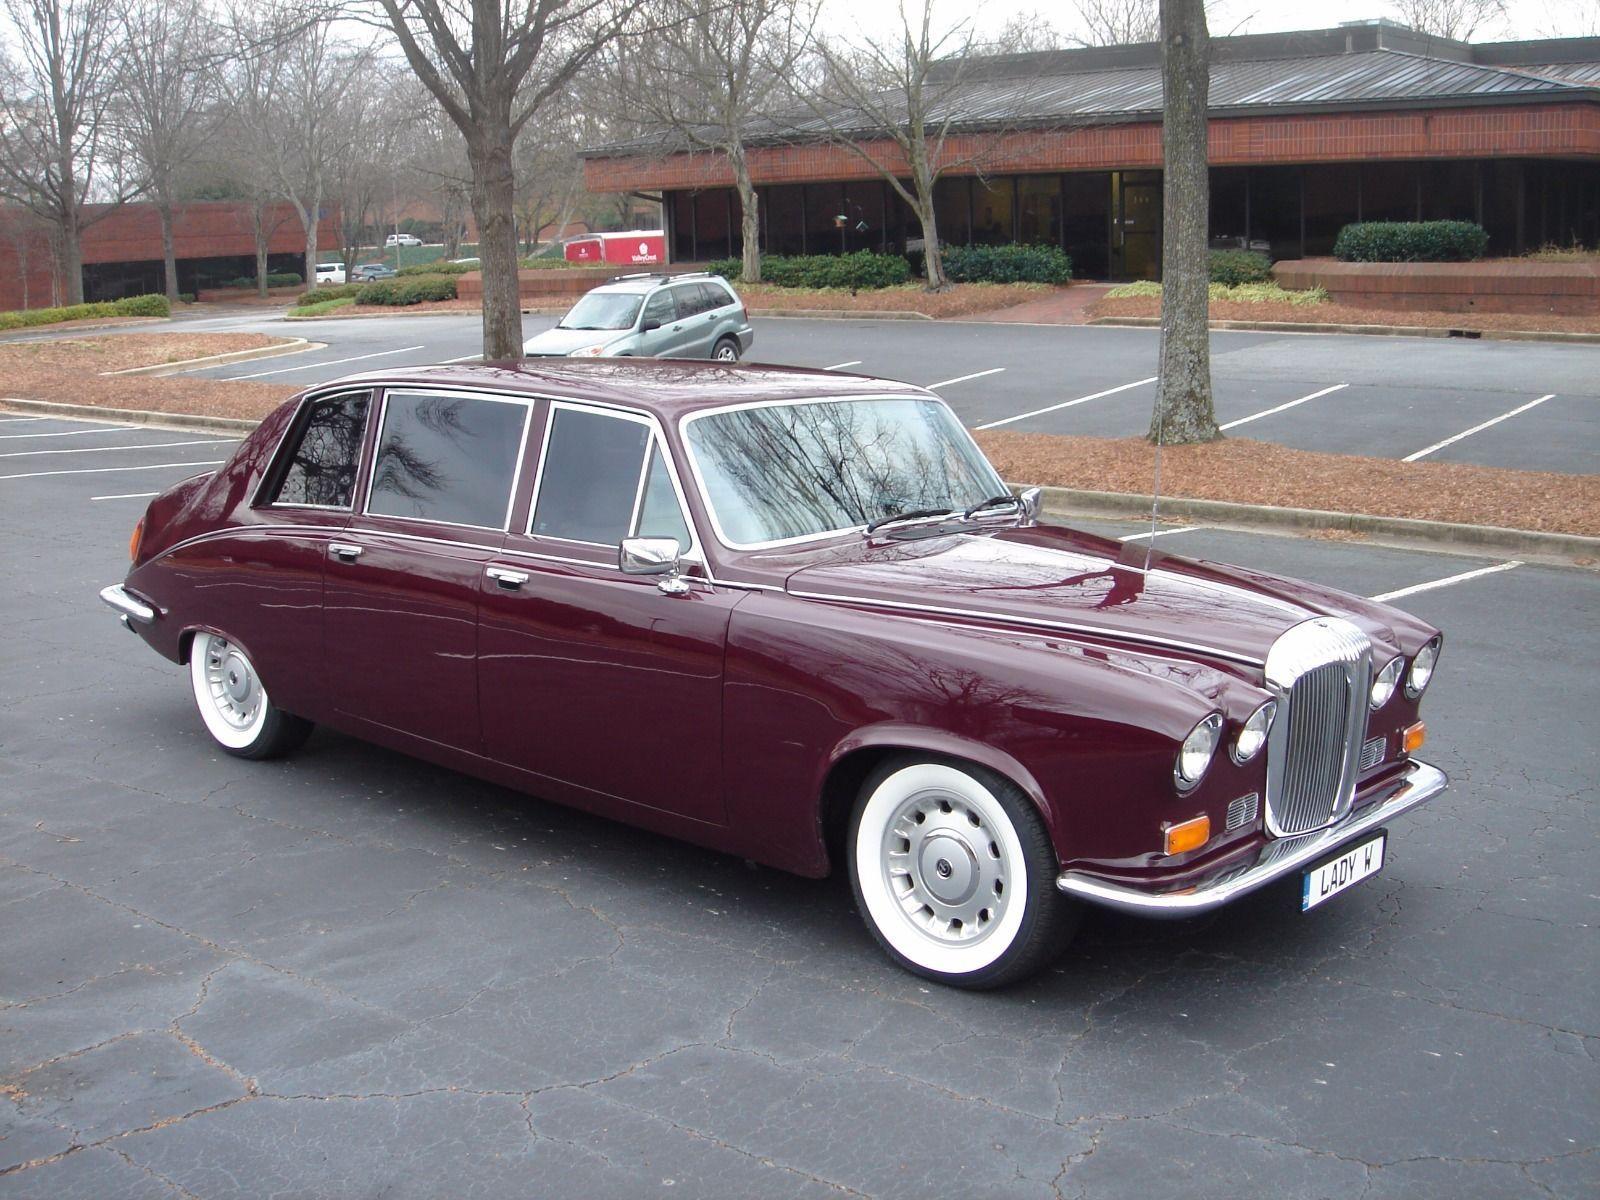 1985 Jaguar Daimler Ds420 Limousine The Only Us Spec Daimler